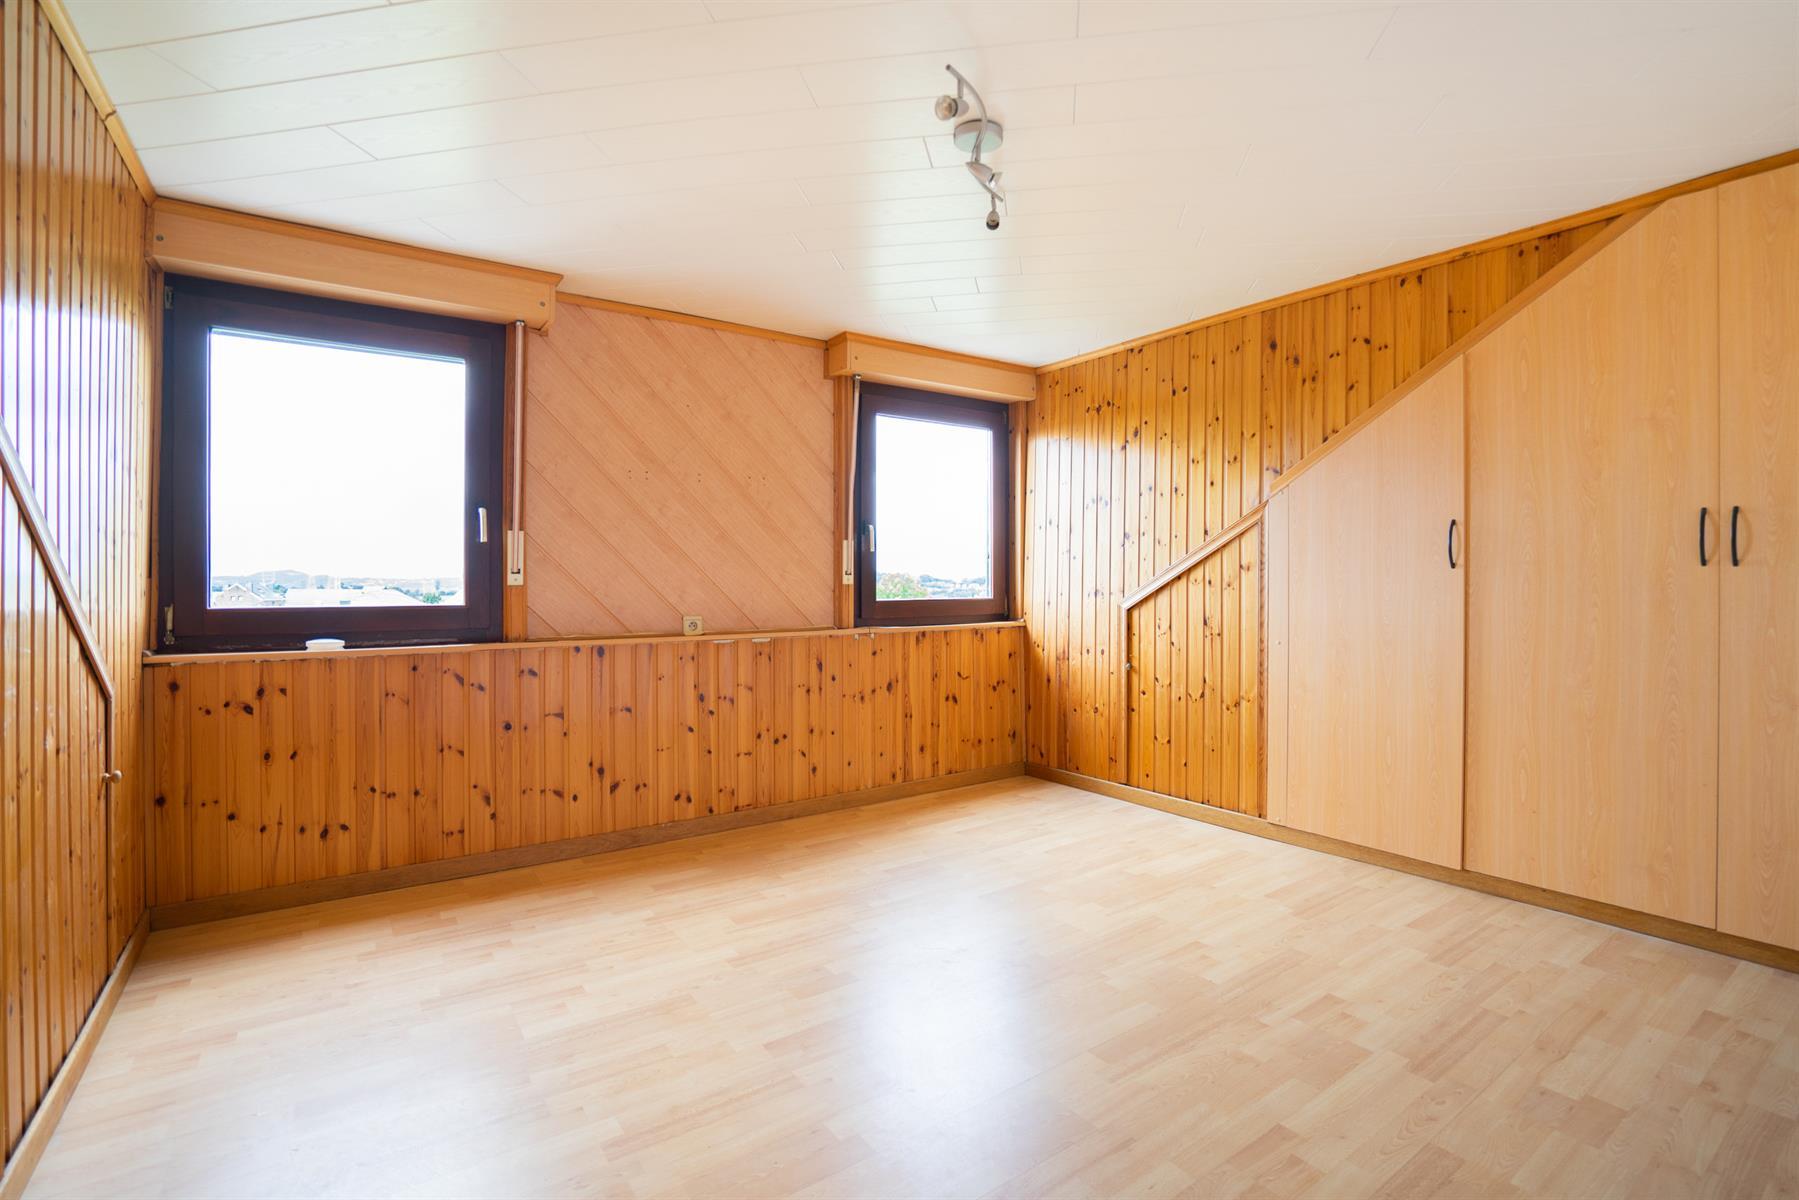 Maison - Beyne-Heusay Bellaire - #4422118-17